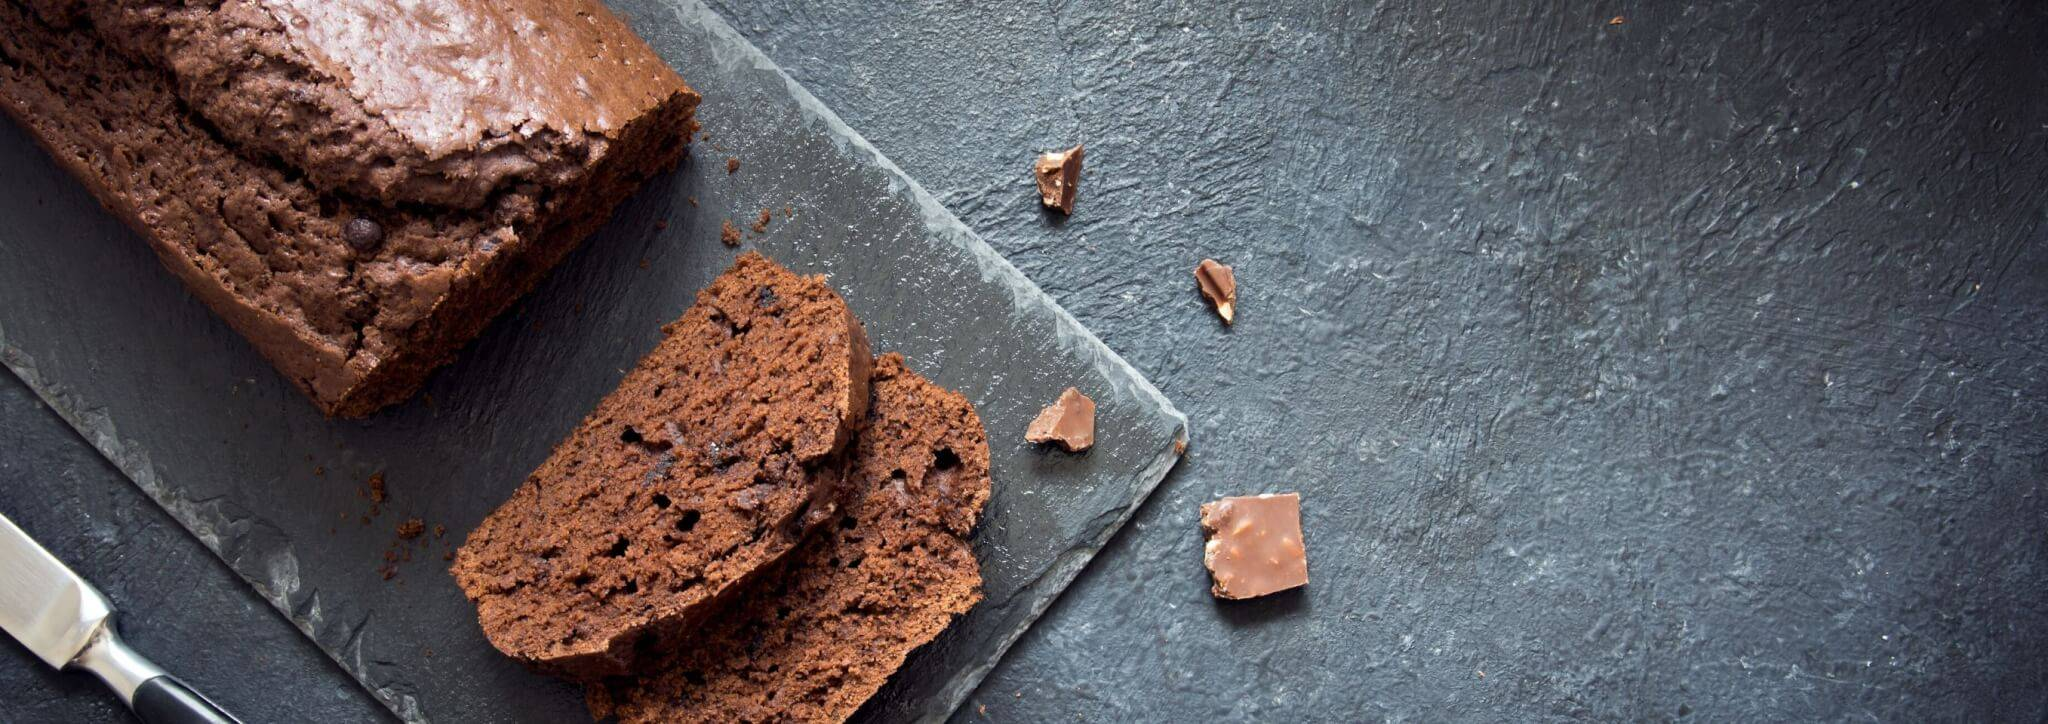 chocolade brood